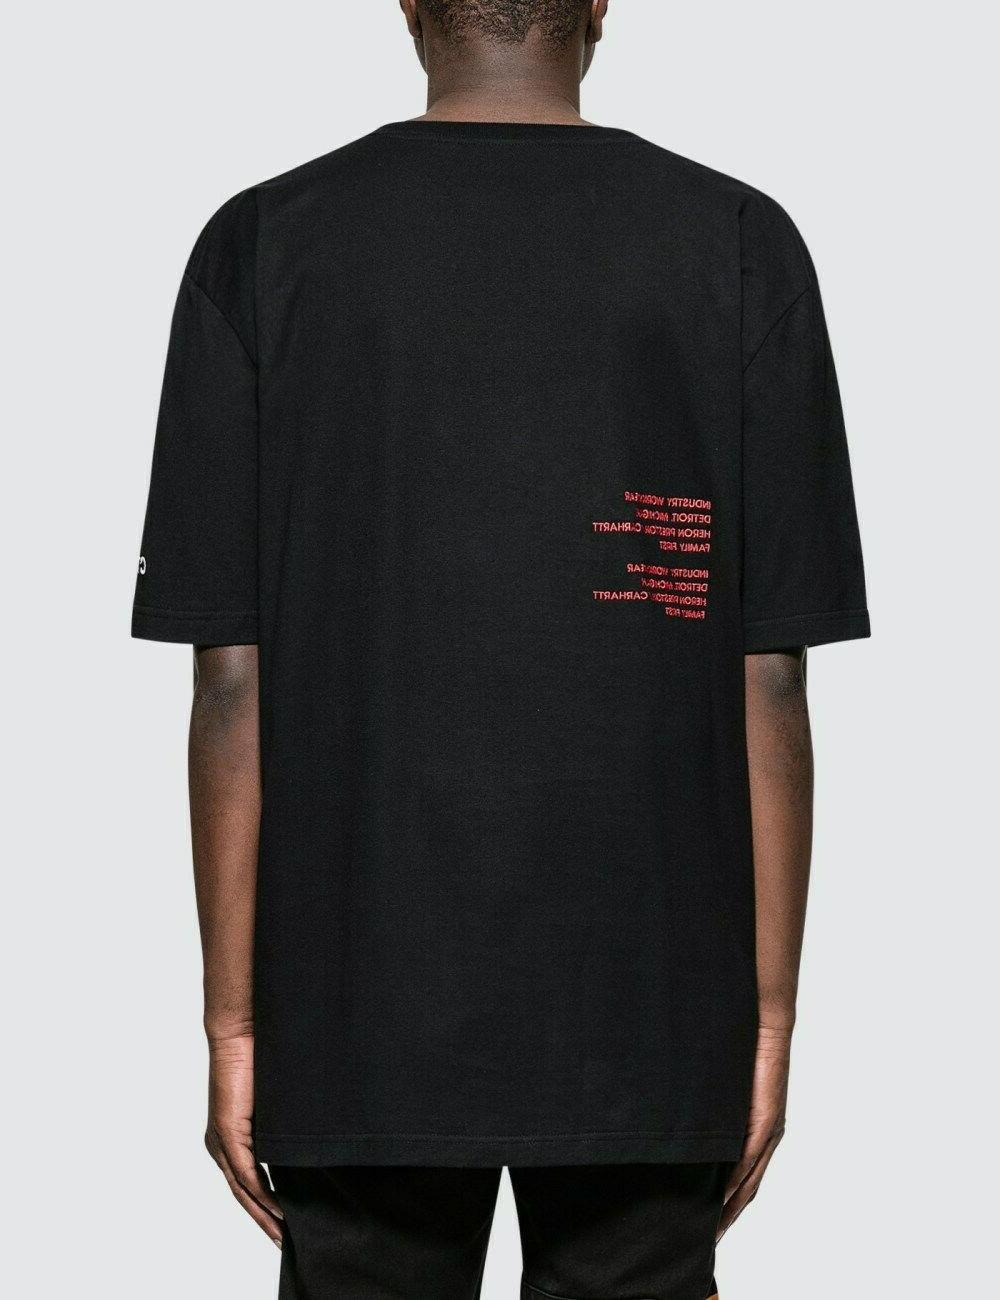 HOT Mens Heron 19ss X CARHARTT Short sleeve t-shirt